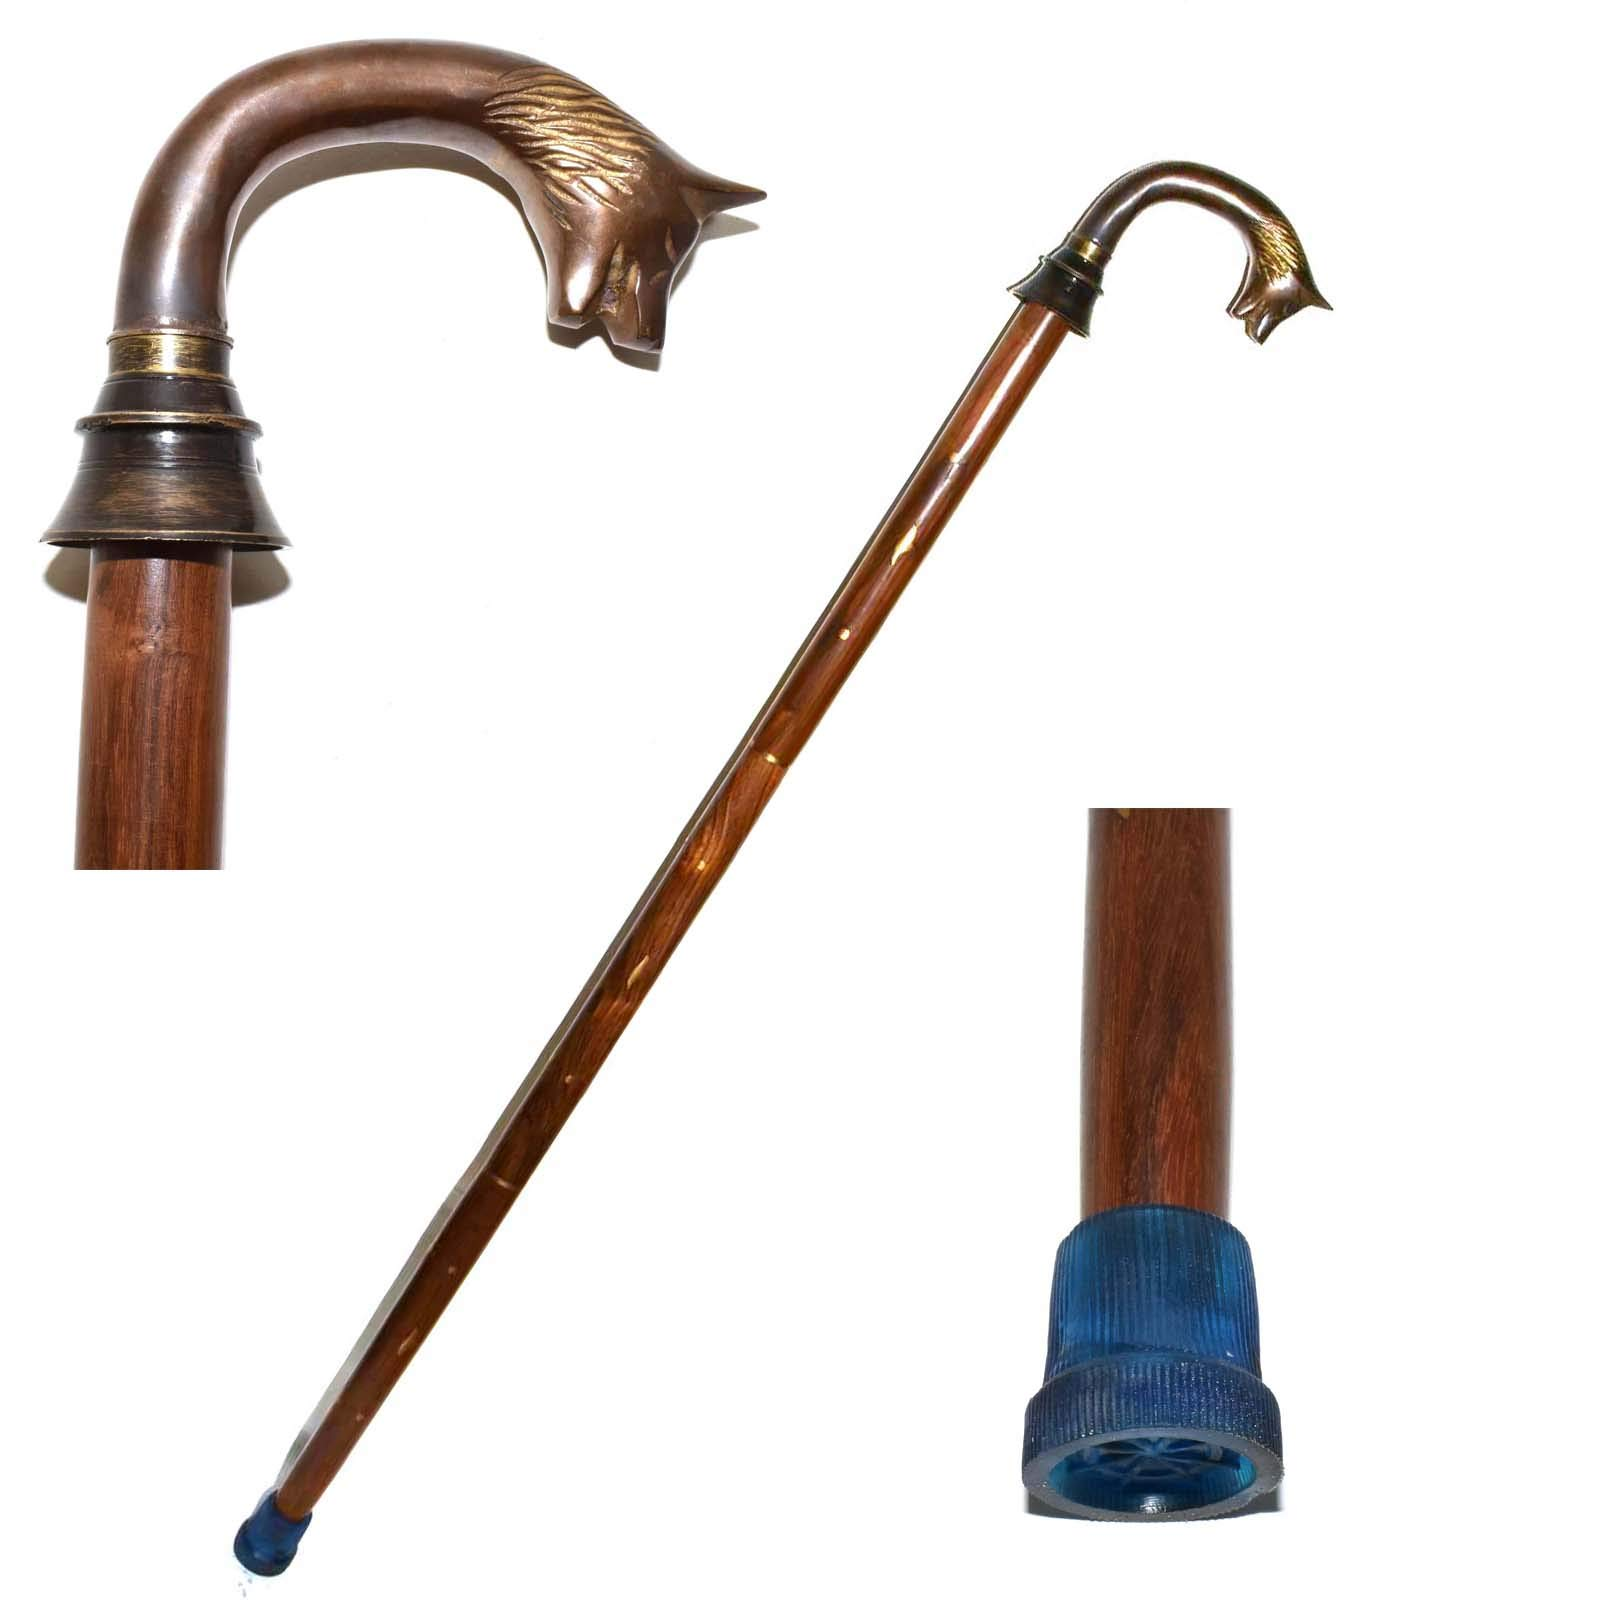 WOLF HEAD Brass Handle Walking Stick Design Vintage Victorian Walking Stick Cane Christmas Gifts, Affordable Gift Decorative Walking Cane Fashion Statement for Men/Women/Seniors/Grandparents! Item New